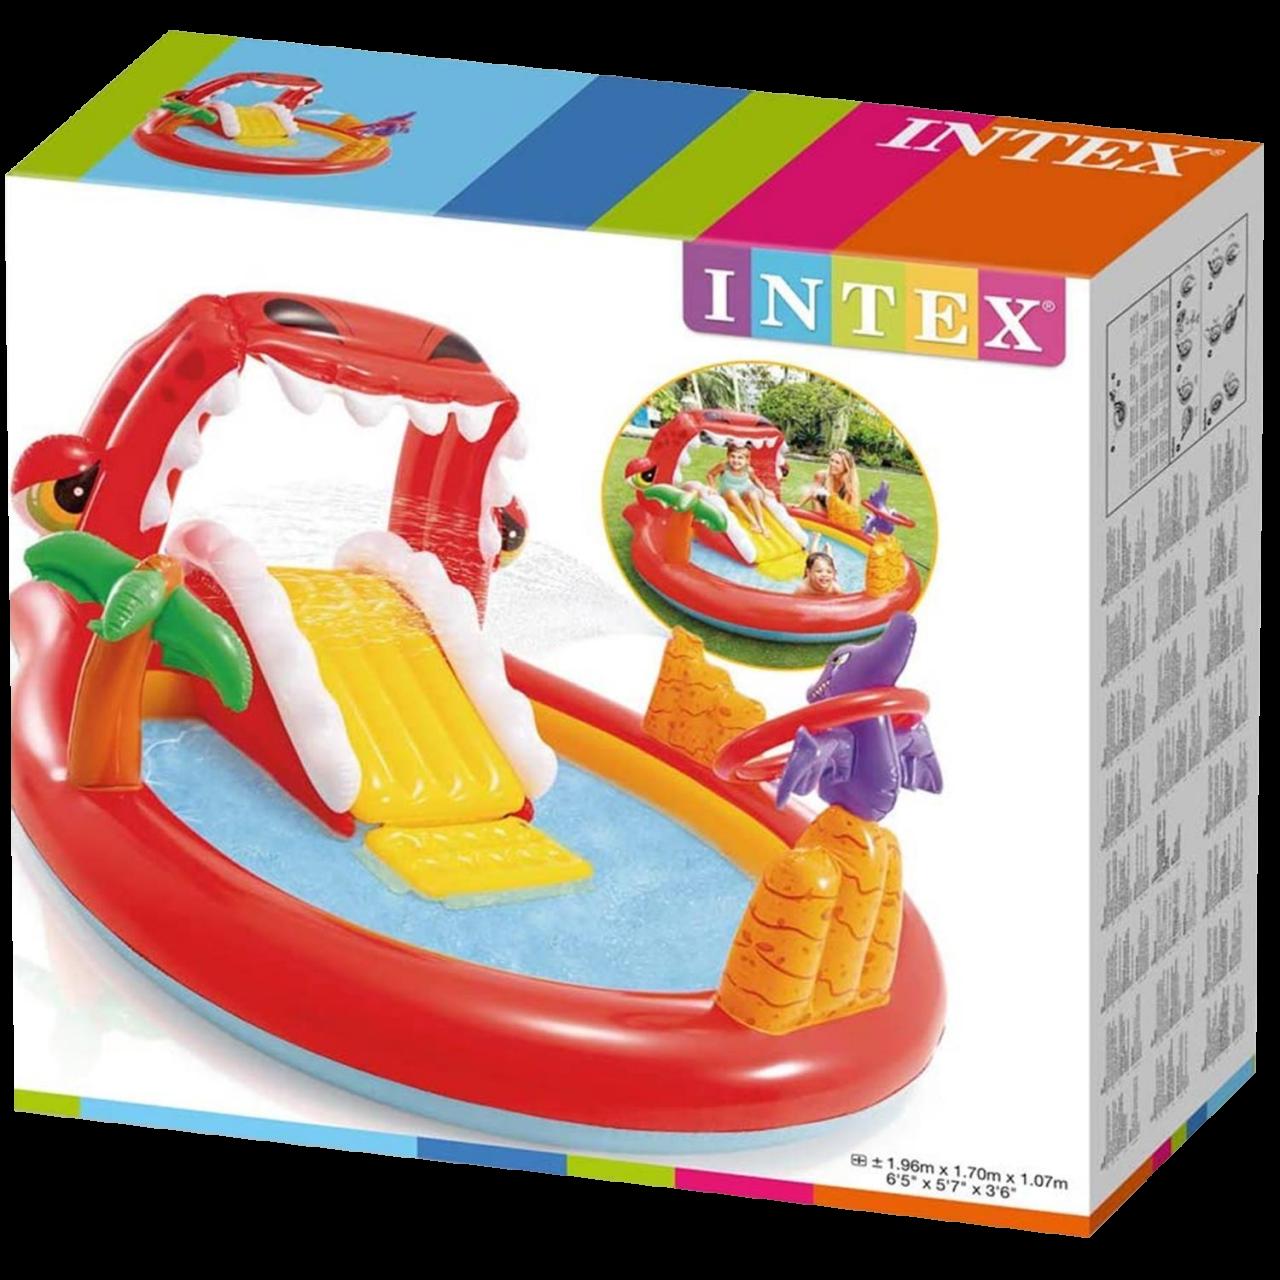 Intex Play Center Aufblasbarer Kinderpool Happy Dino 196x170x107 cm 57163